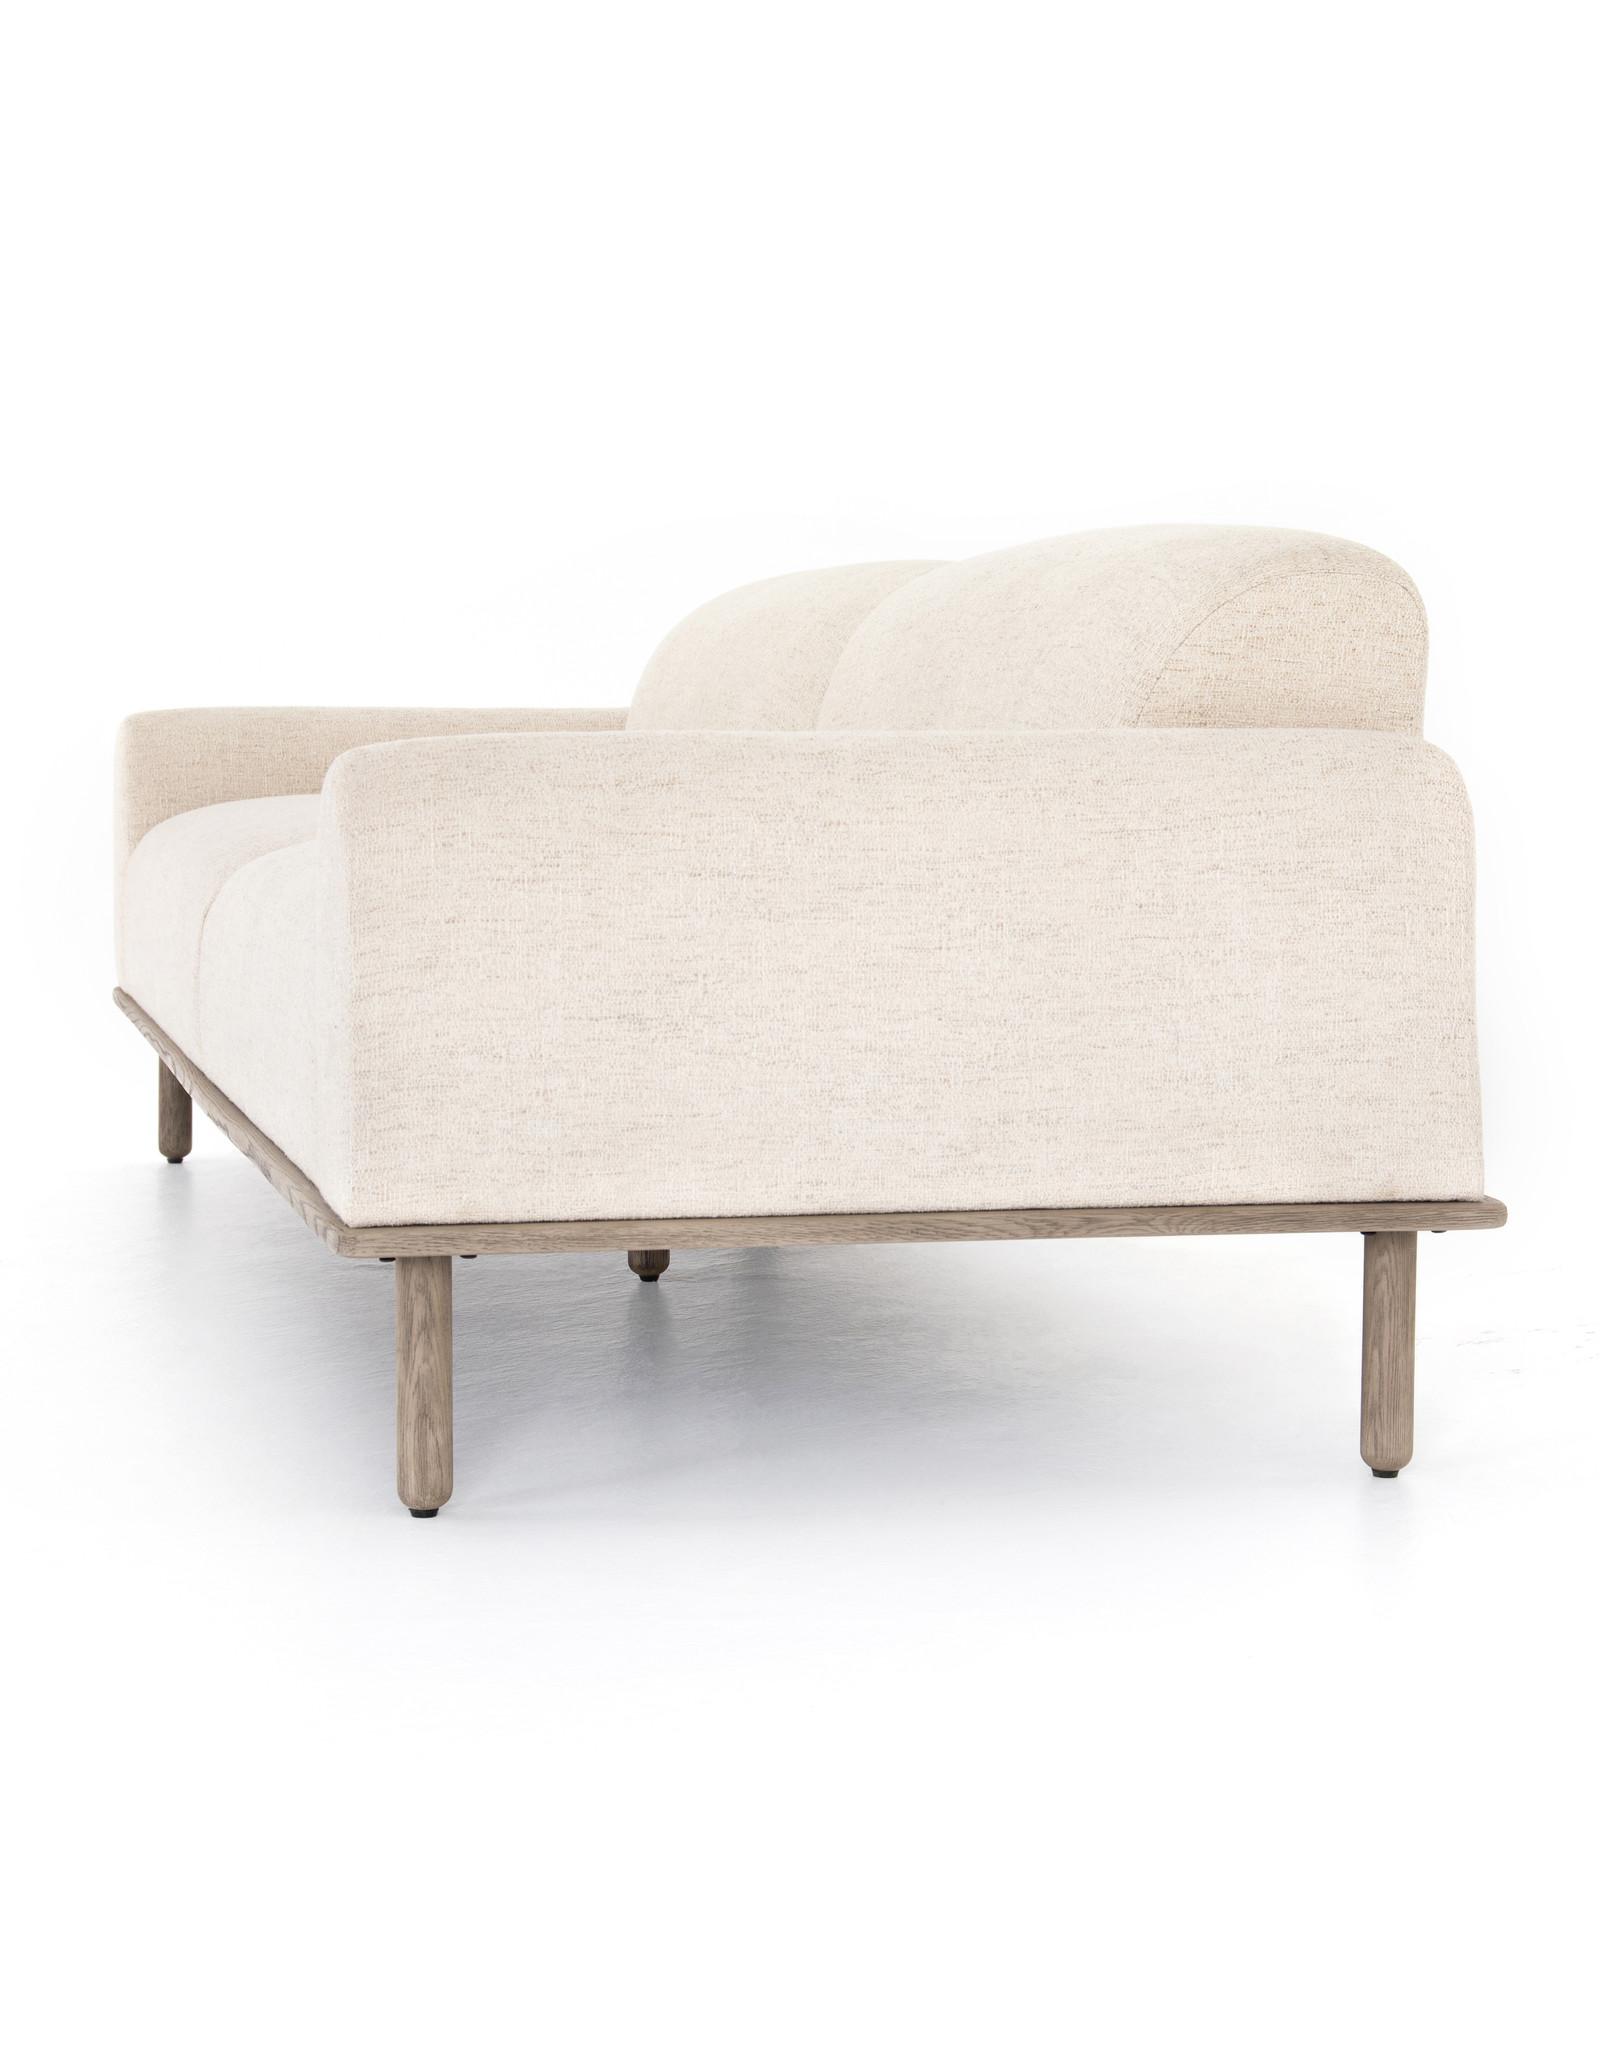 *Clark Sofa - Encino Bisque